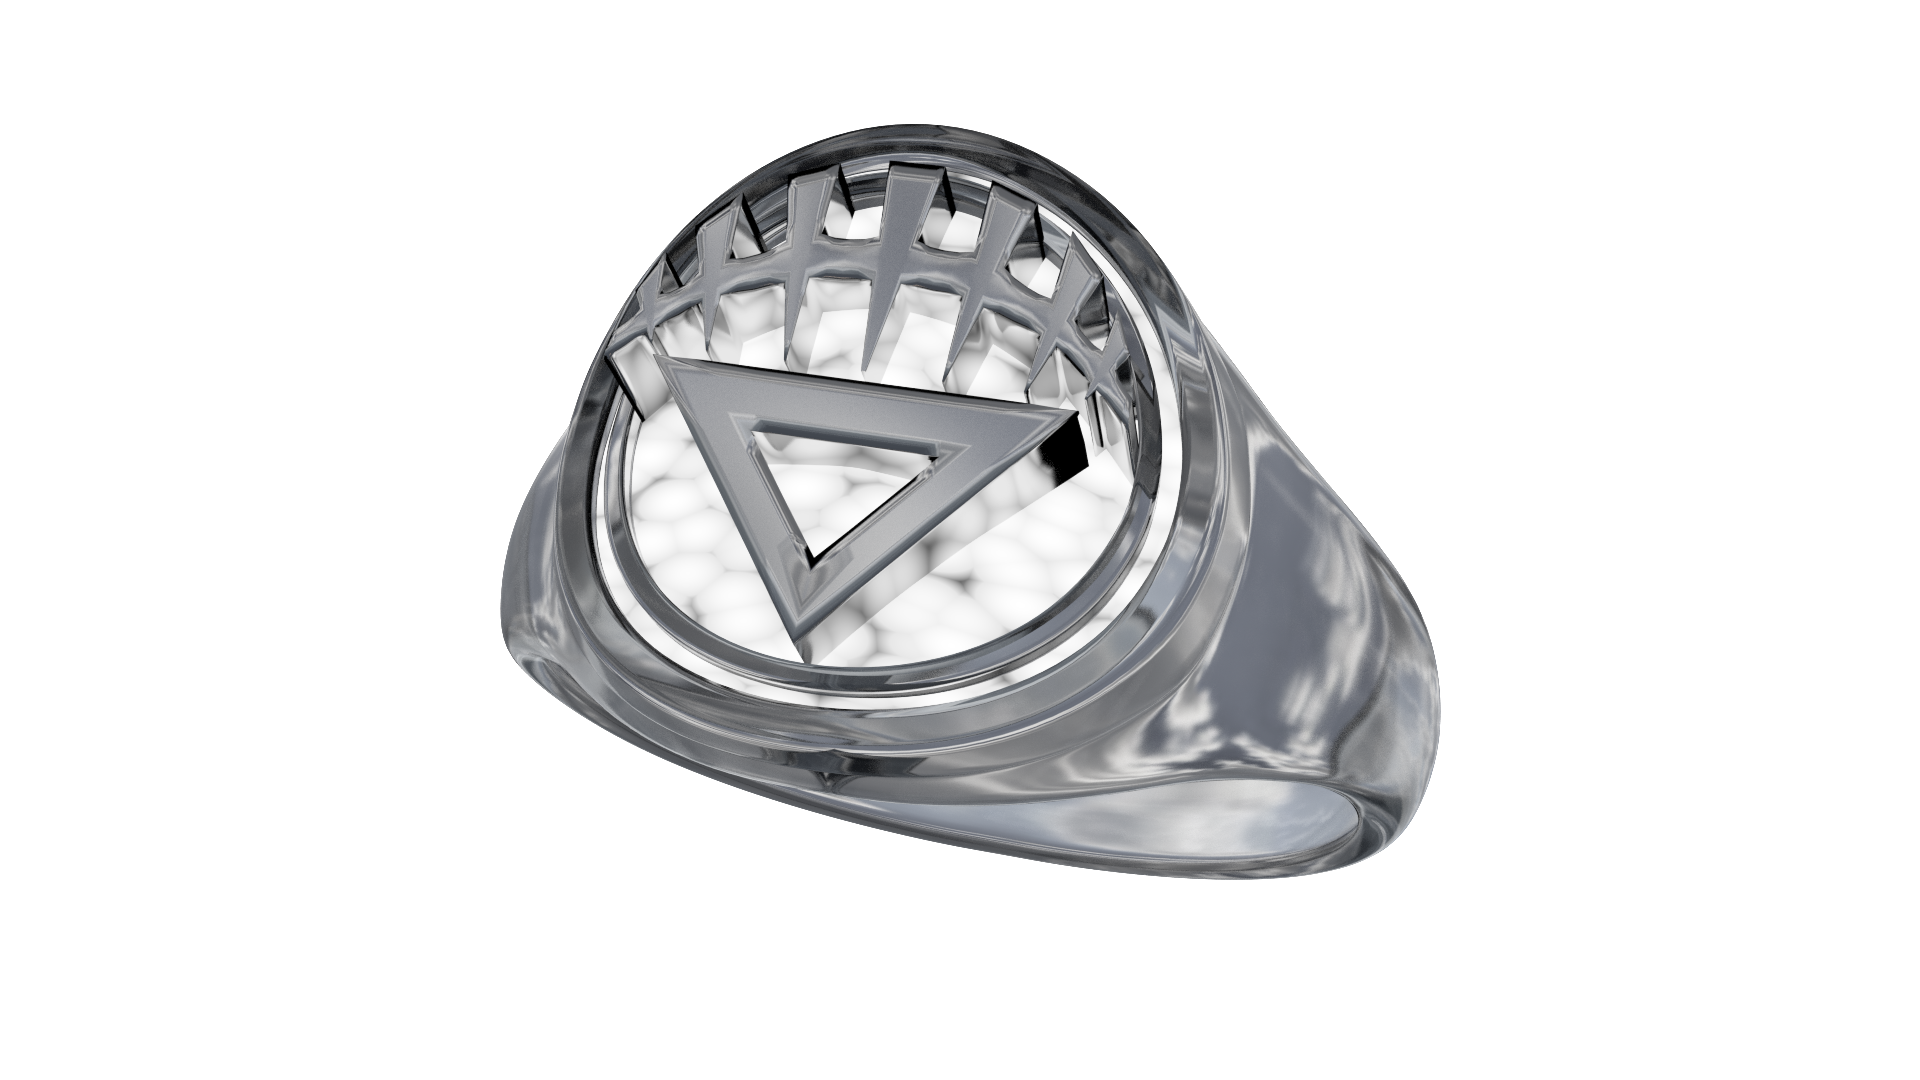 white lantern ring by silvercatfan on deviantart